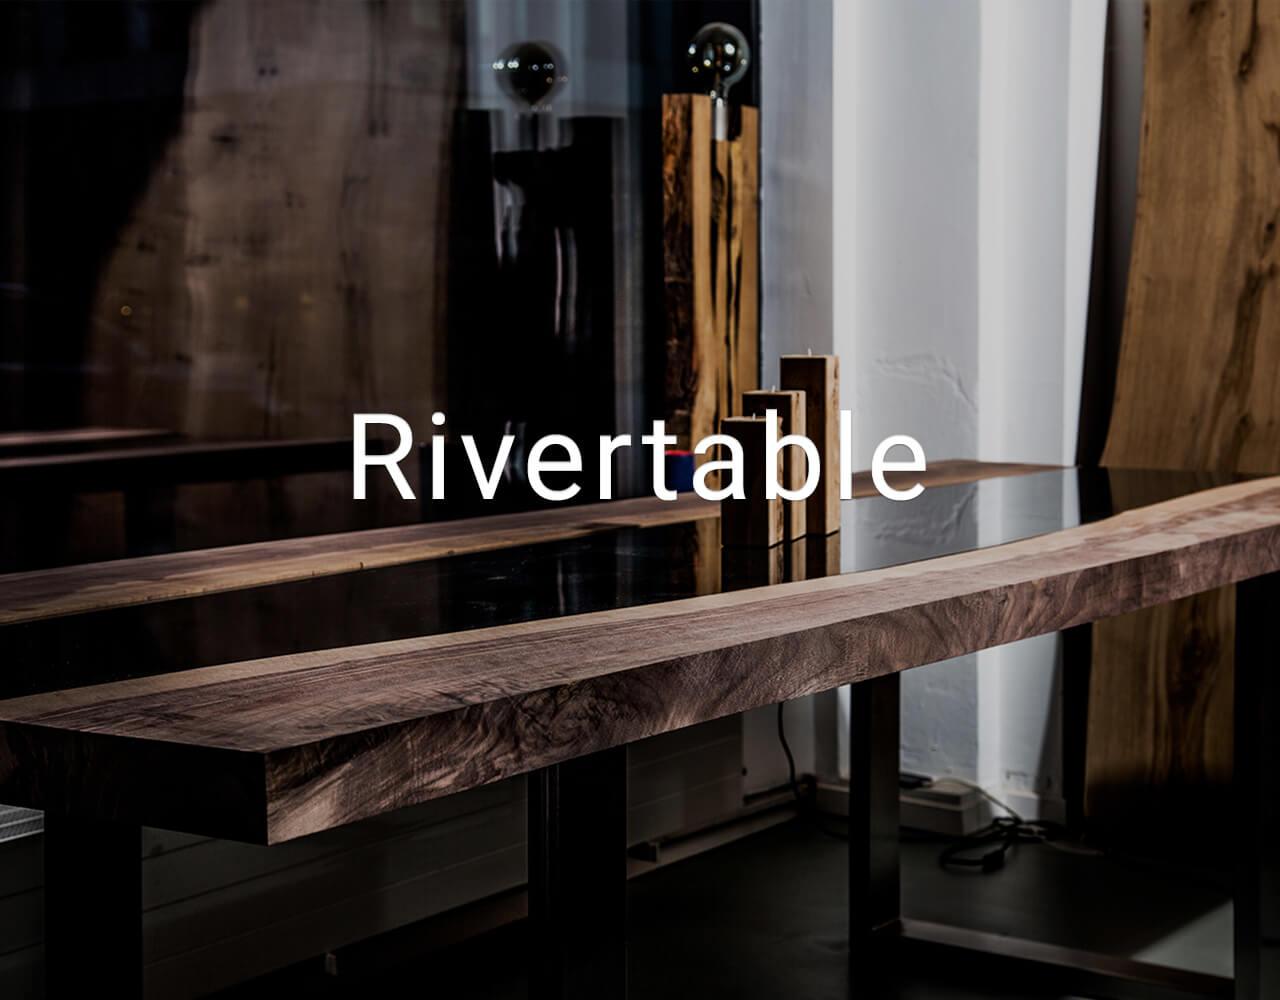 Rivertable